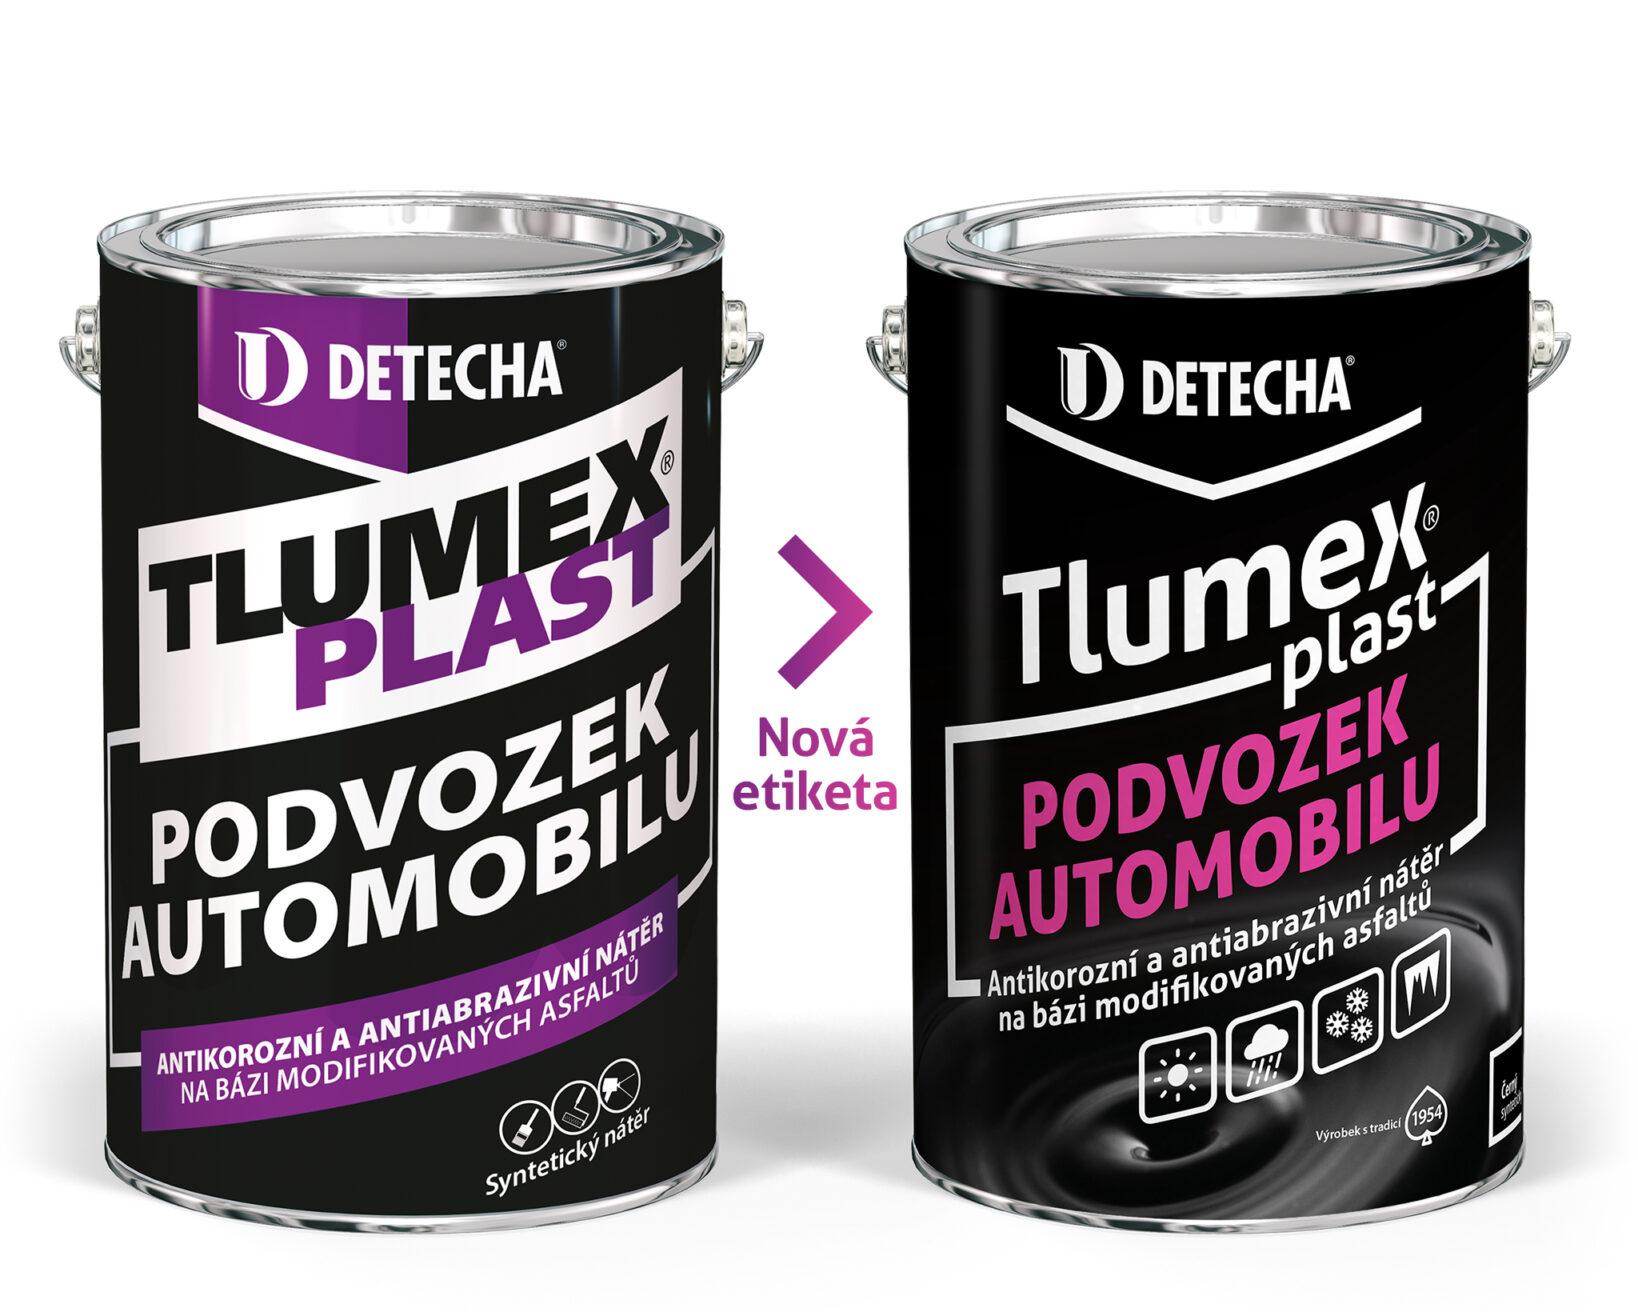 DETECHA Tlumex plast 4 kg